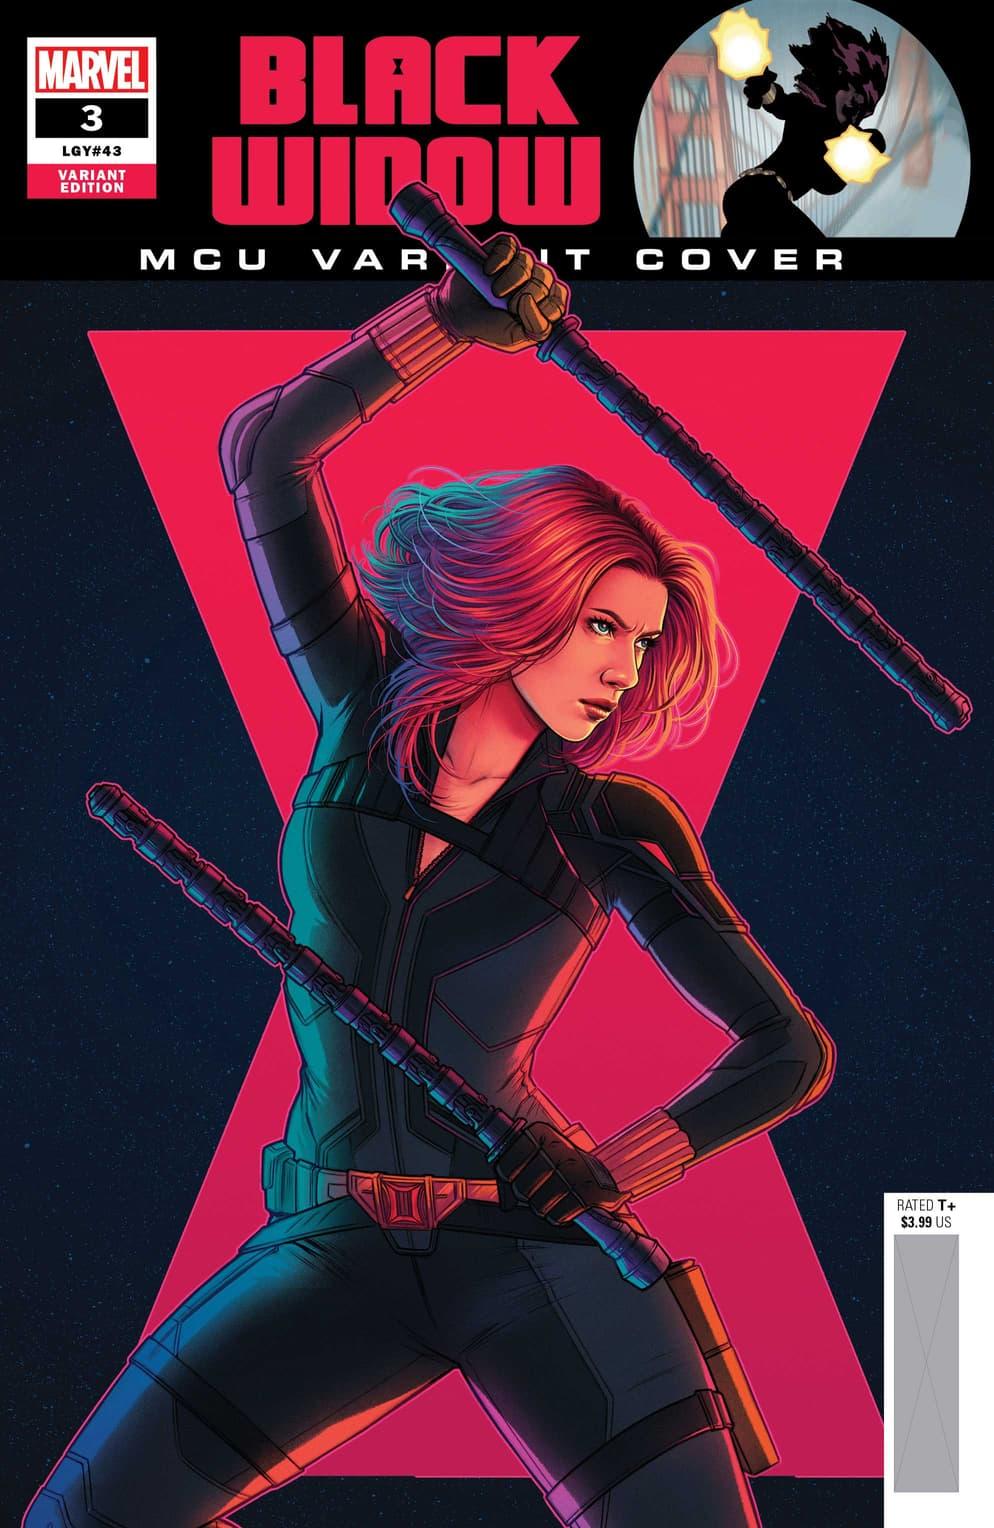 BLACK WIDOW (2020) #3 Variant Cover by Jen Bartel